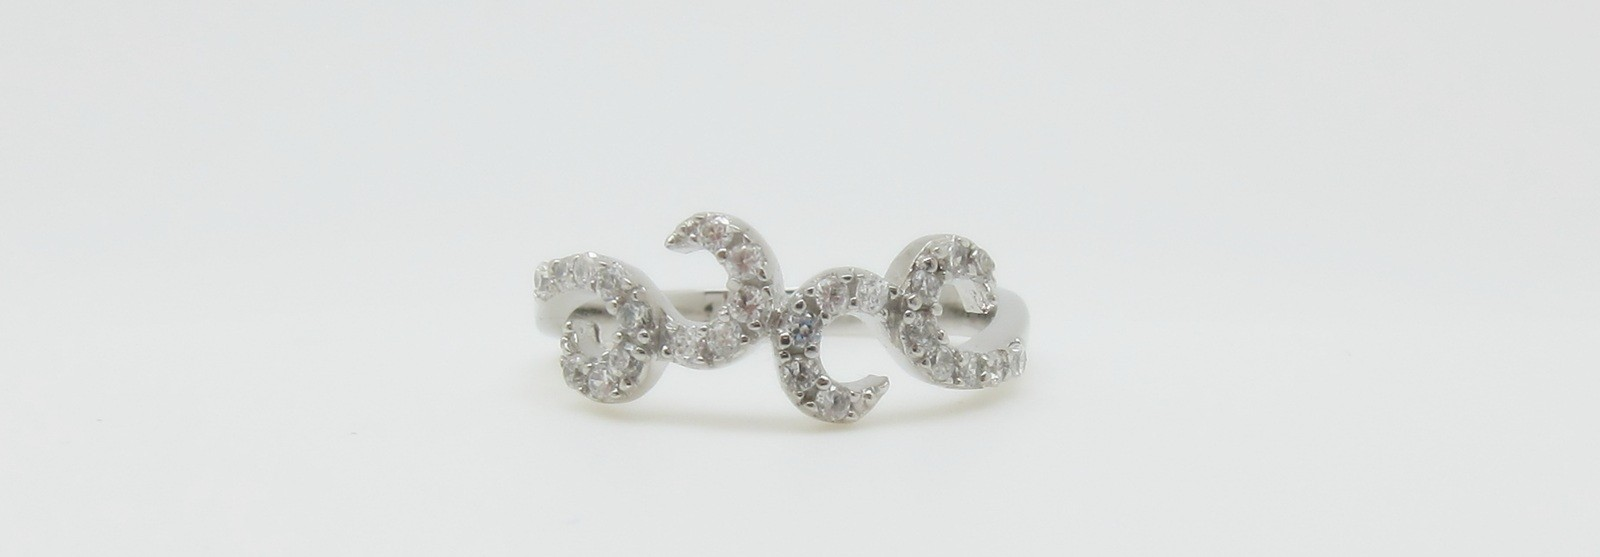 Conjunto pendientes colgante anillo pave picos plata